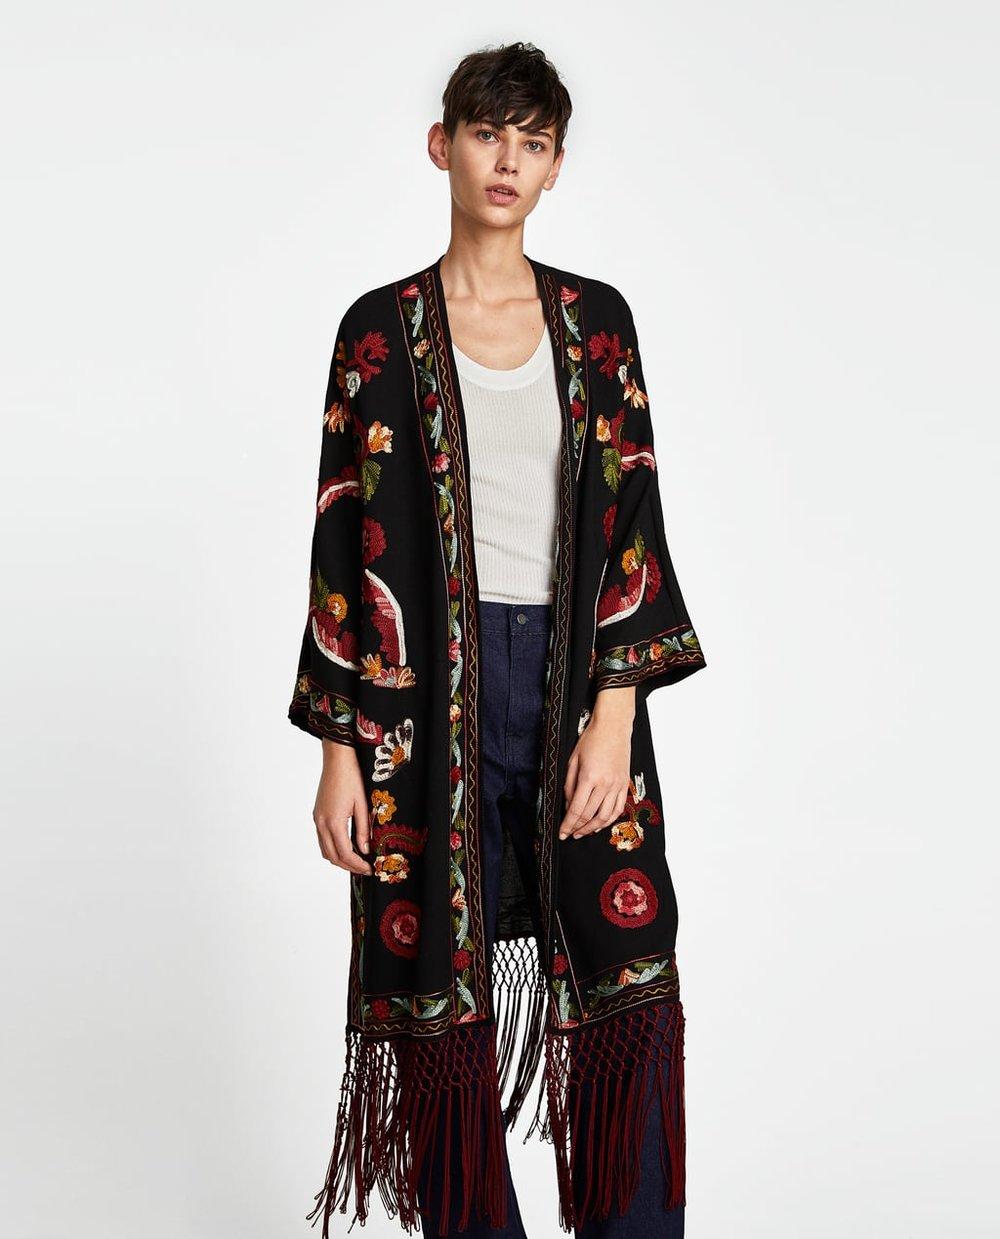 https://www.zara.com/ca/en/embroidered-kimono-with-fringing-p06428040.html?v1=5840036&v2=1080795